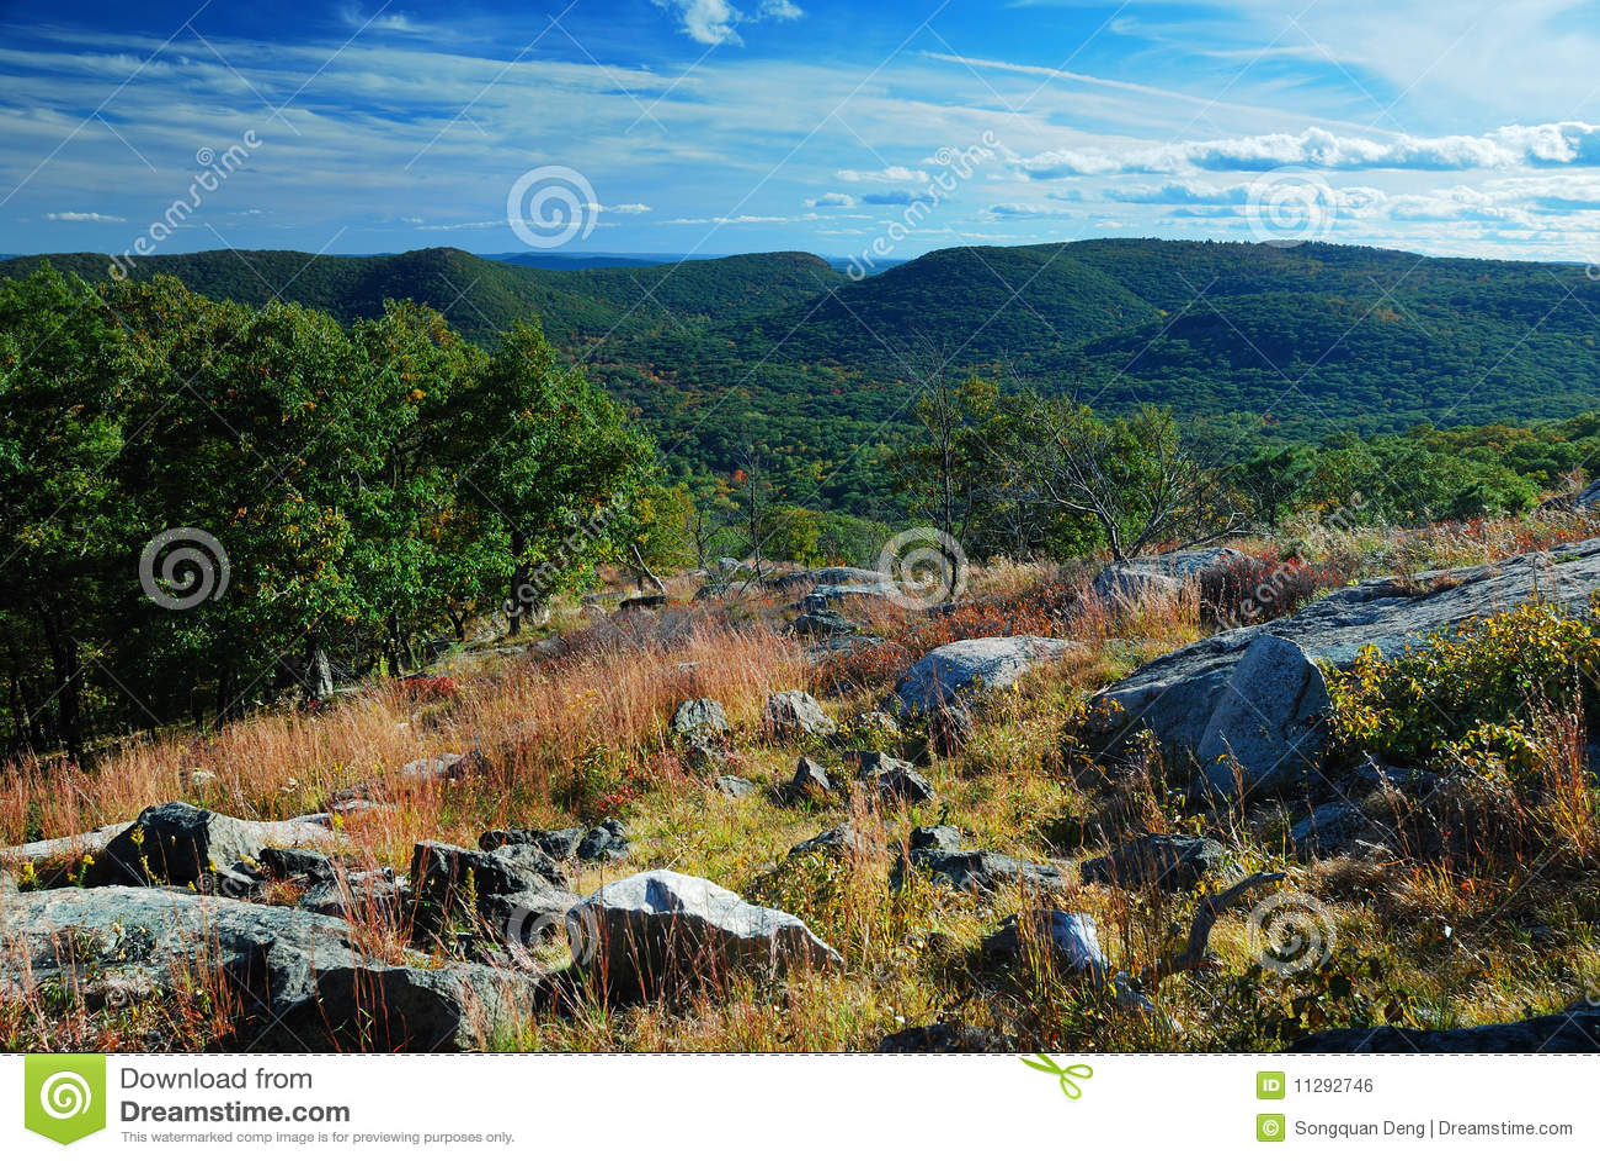 De Berg van de rots